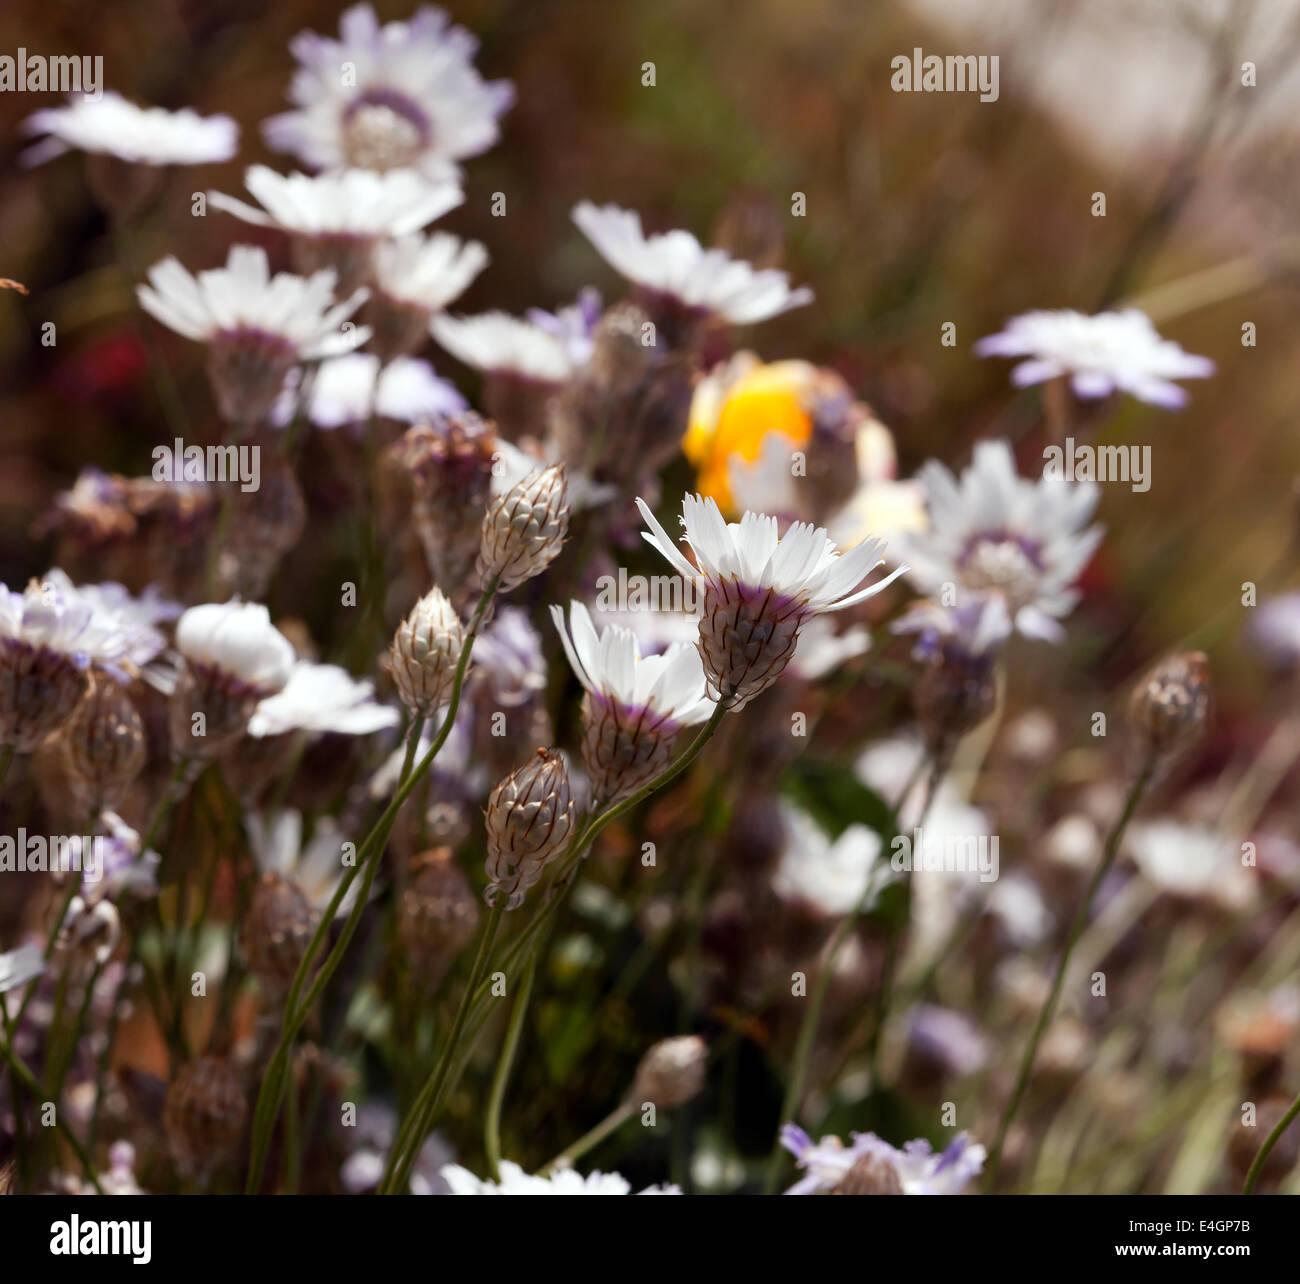 Imagen de de Catananche caerulea 'amor' blanca crecen en el jardín sensorial, Beckenham Park Place, Imagen De Stock